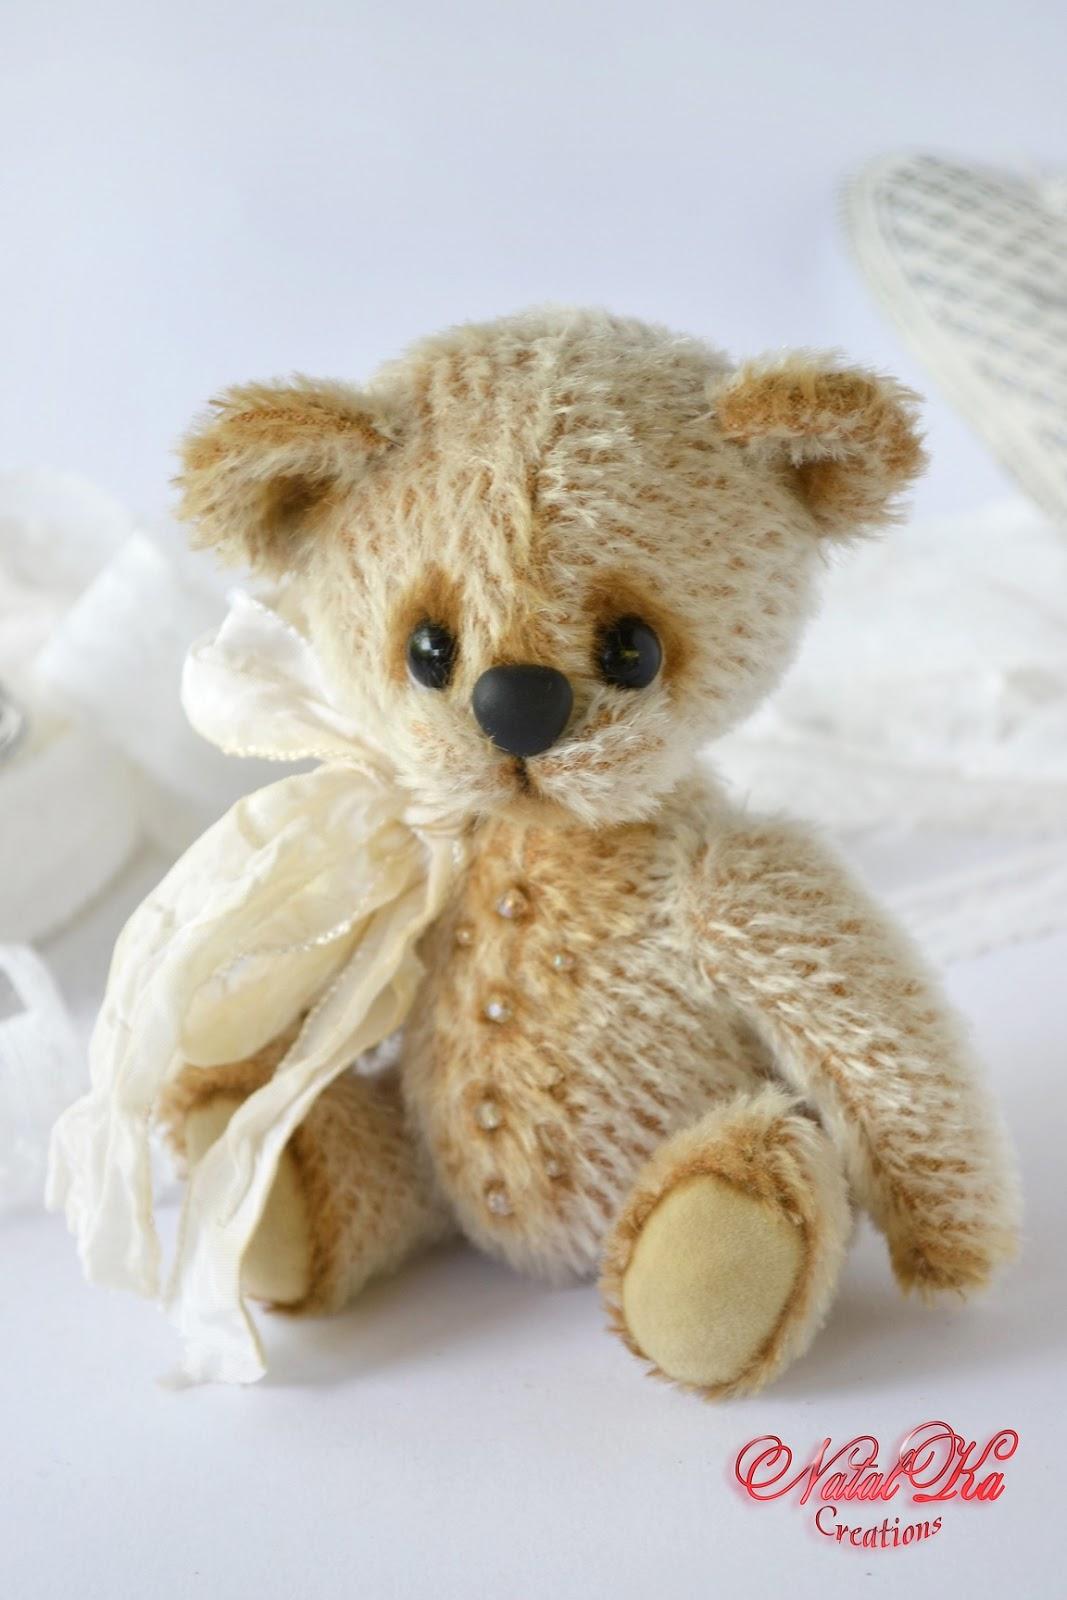 Авторский мишка тедди ручной работы от NatalKa Creations. Artist teddy bear handmade by NatalKa Creations.